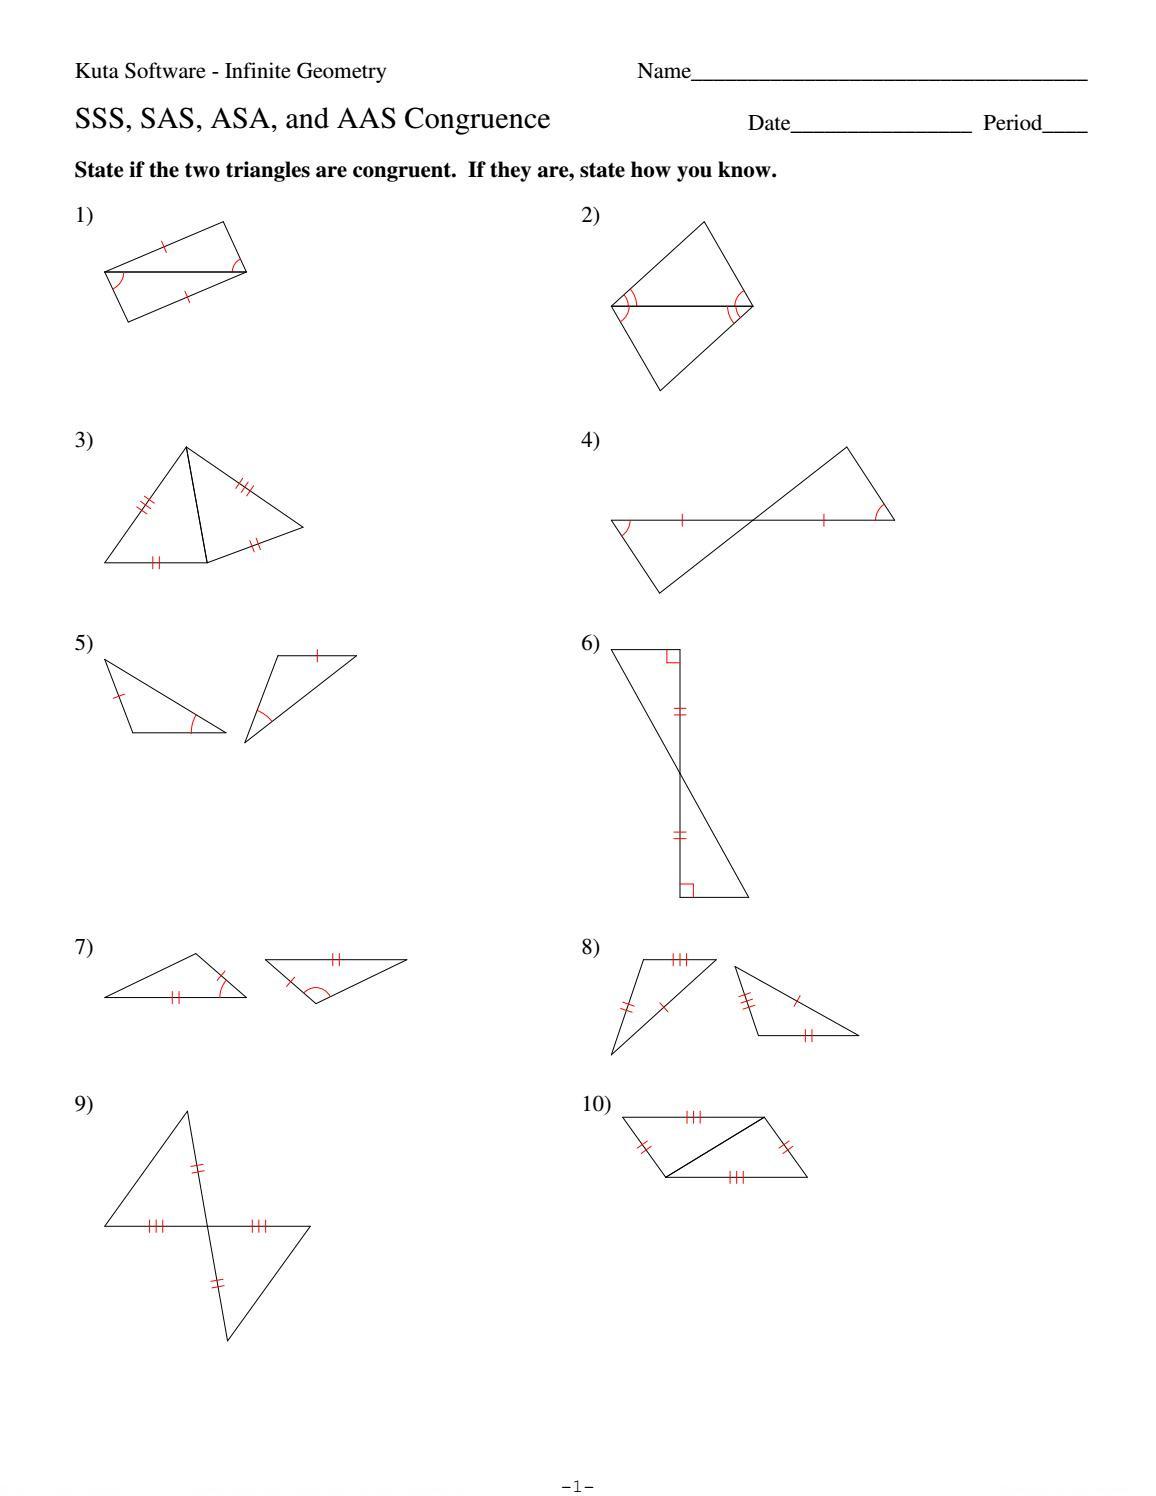 4 Sss Sas Asa And Aas Congruencehhs Geometry